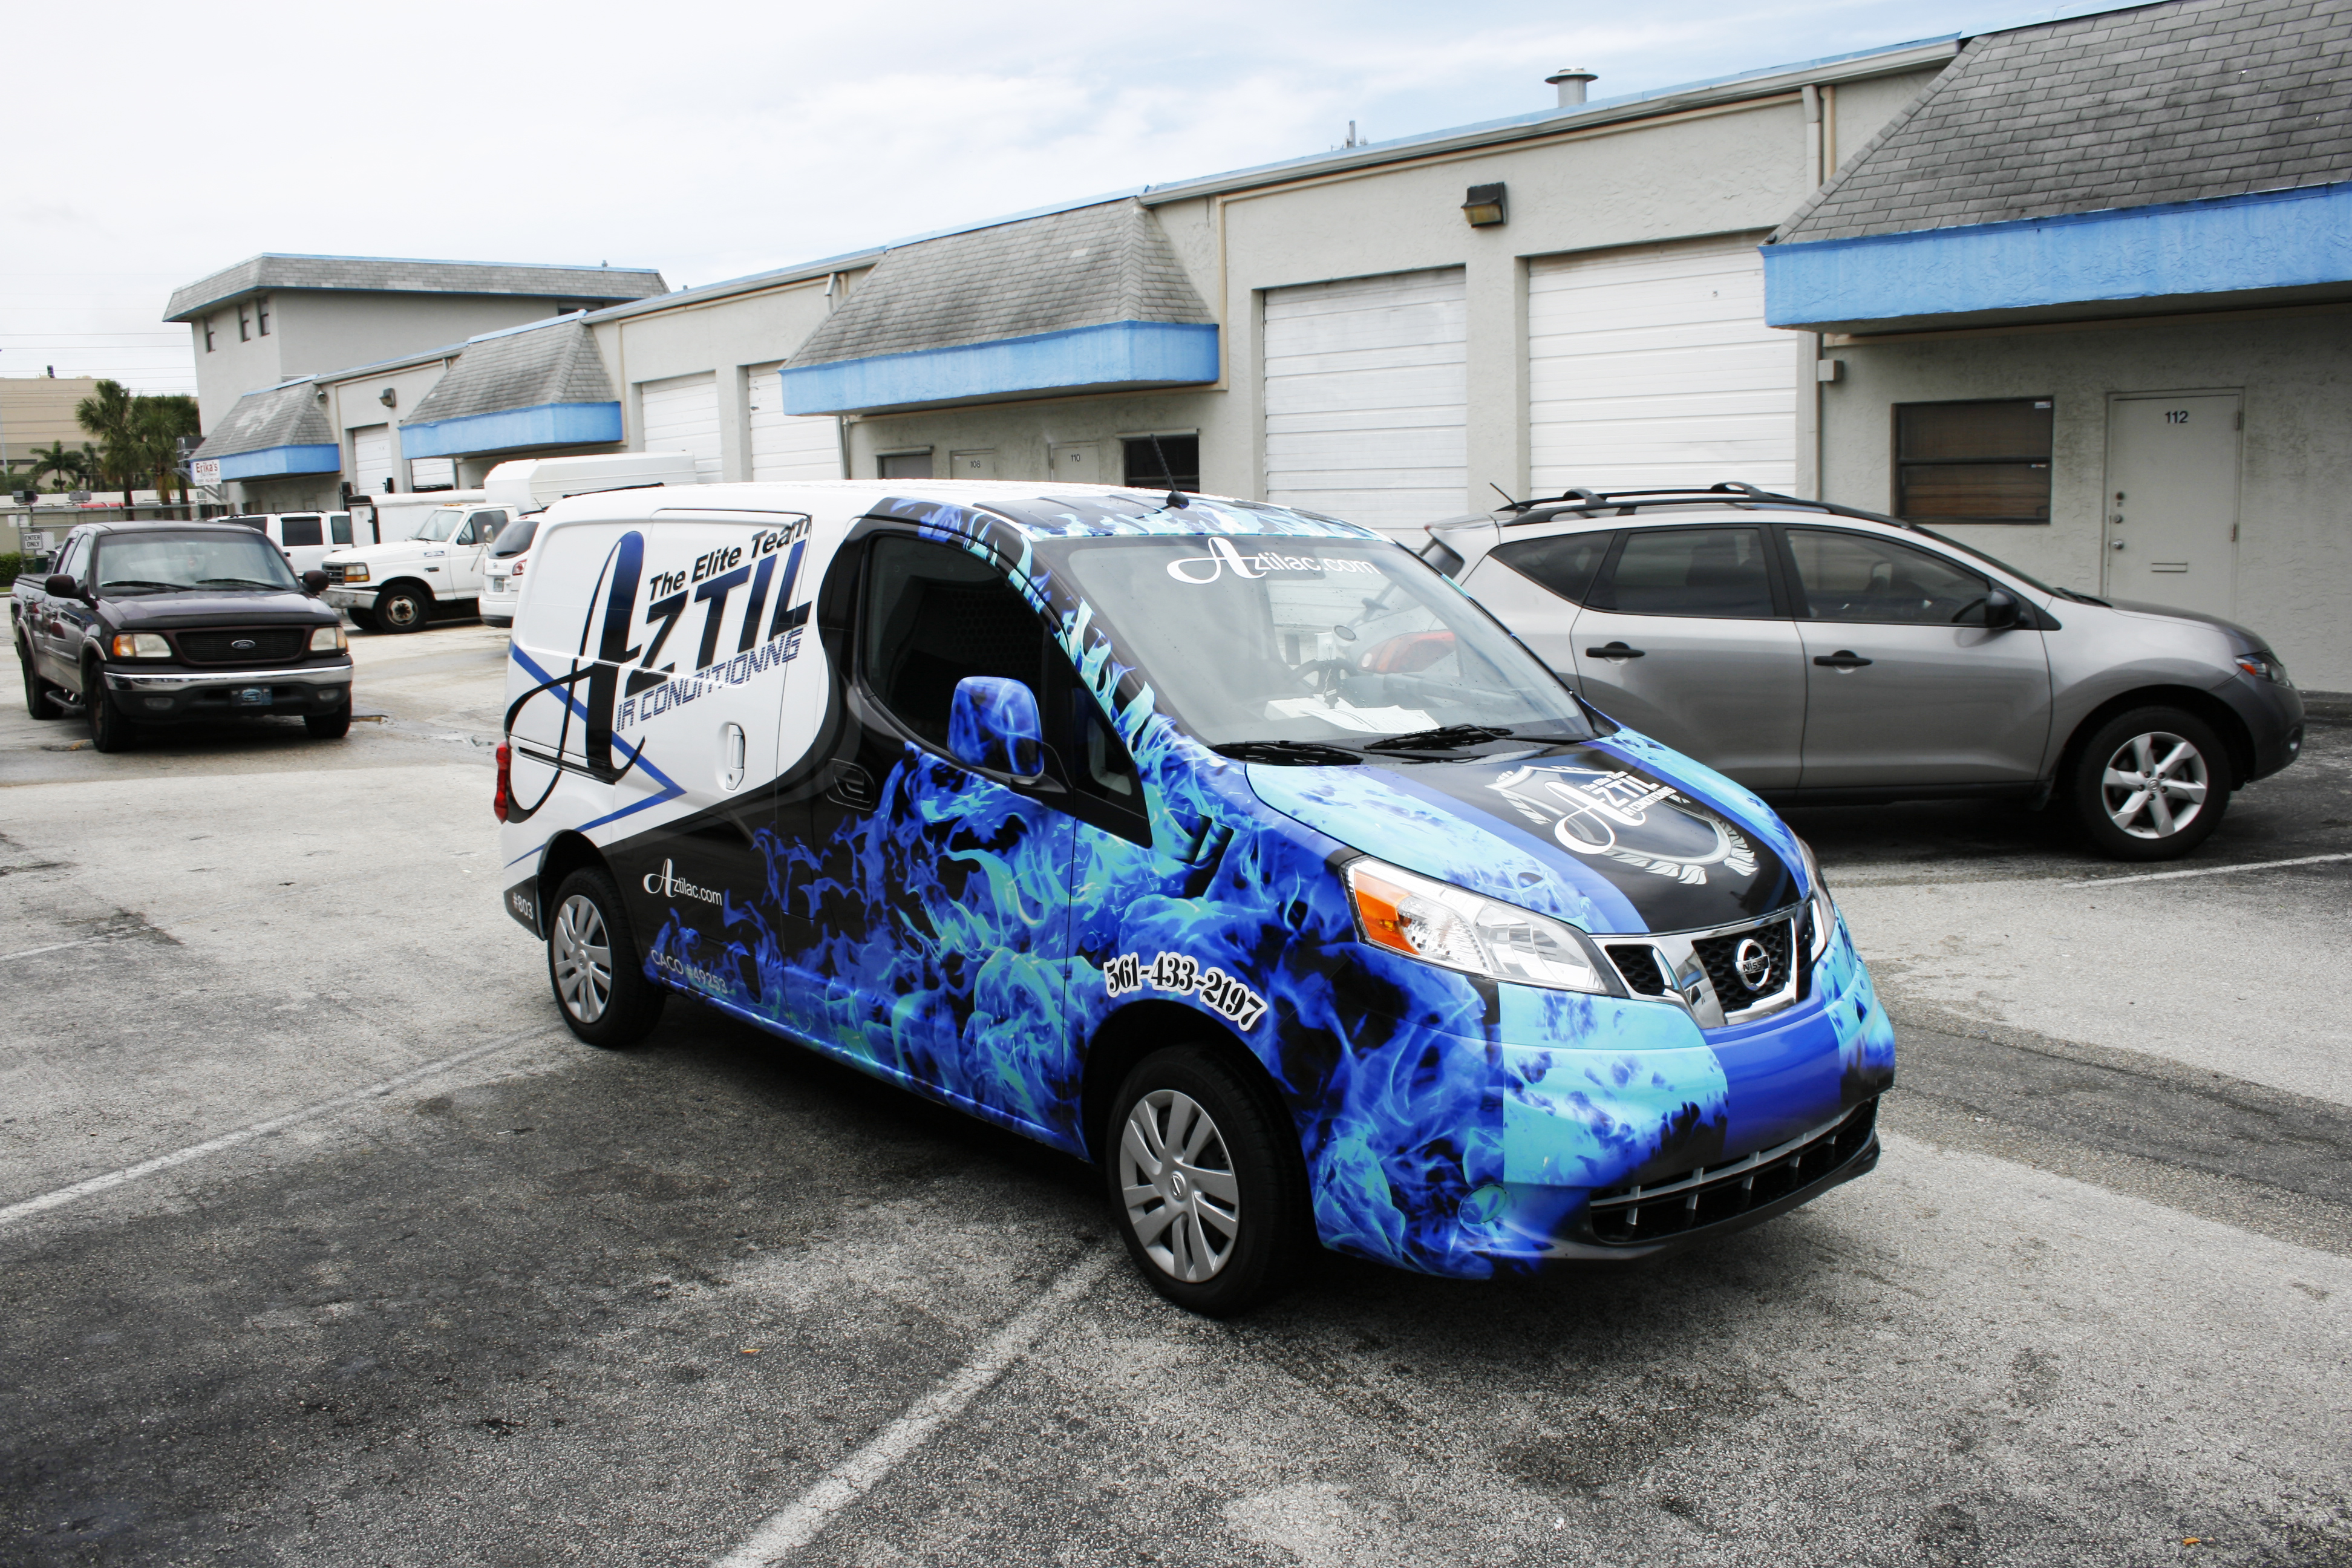 Nissan Nv 200 3m Vinyl Vehicle Wrap West Palm Beach Florida